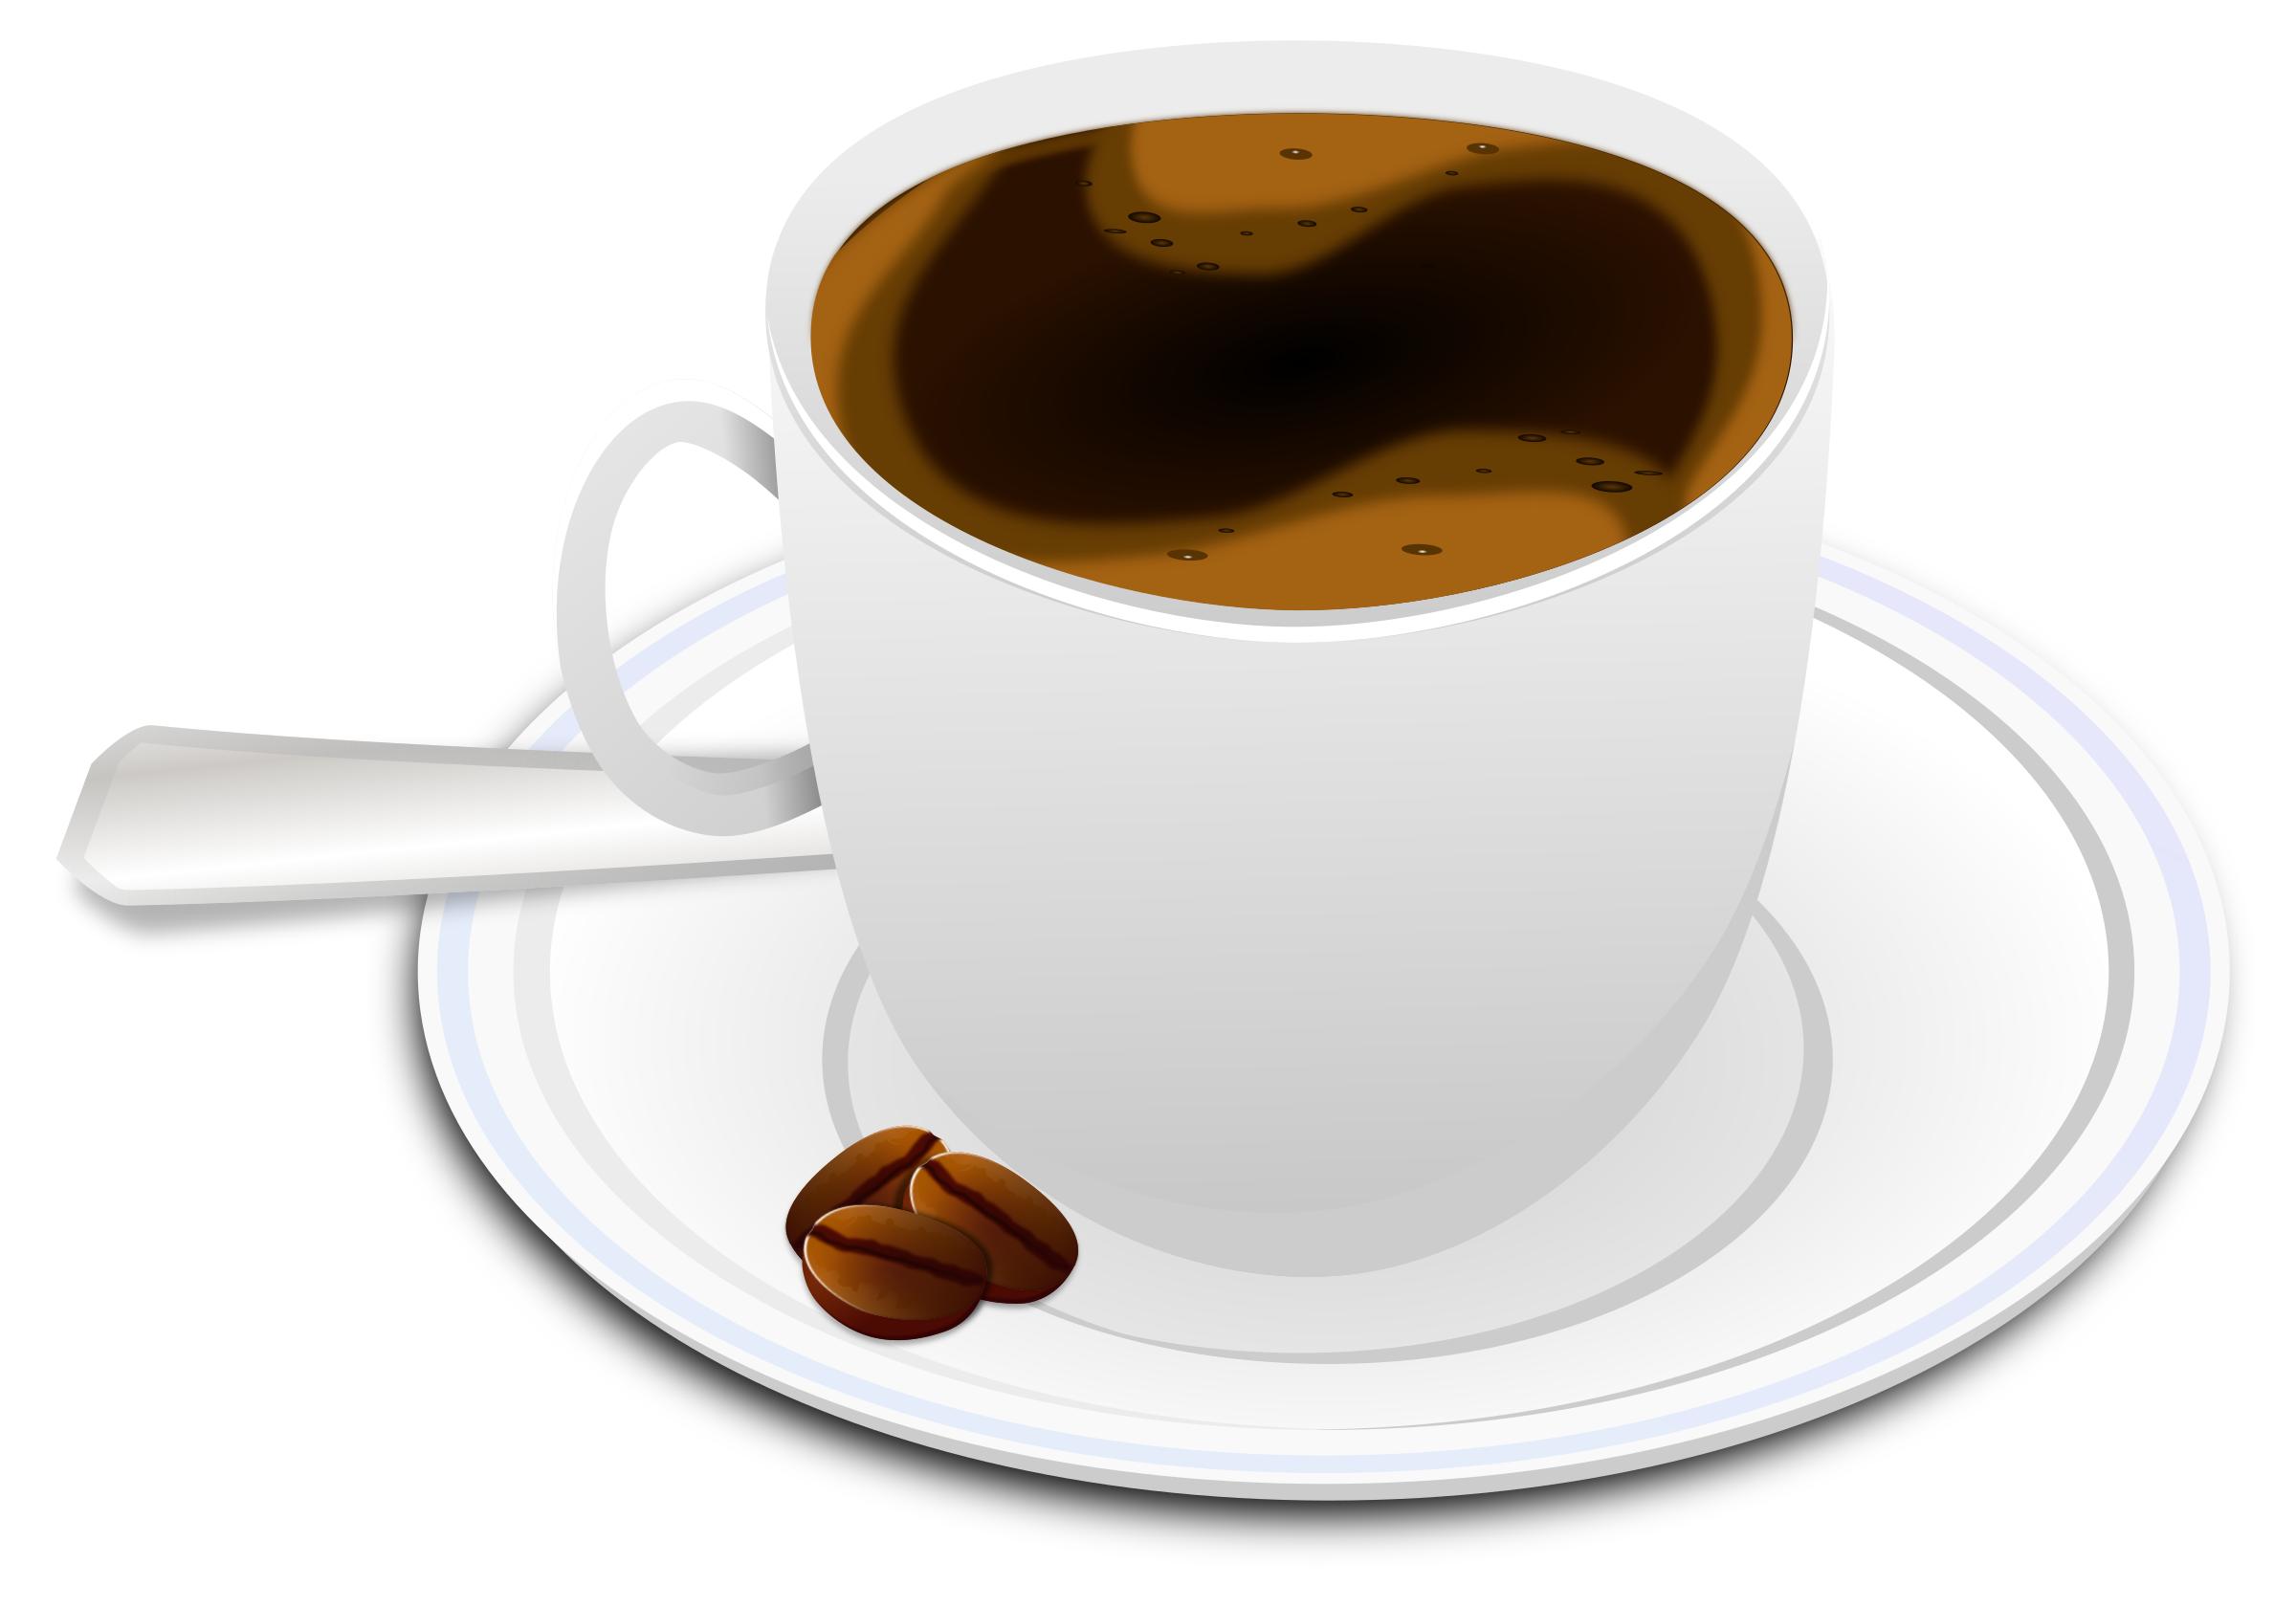 Cup clipart espresso Espresso Clipart Espresso